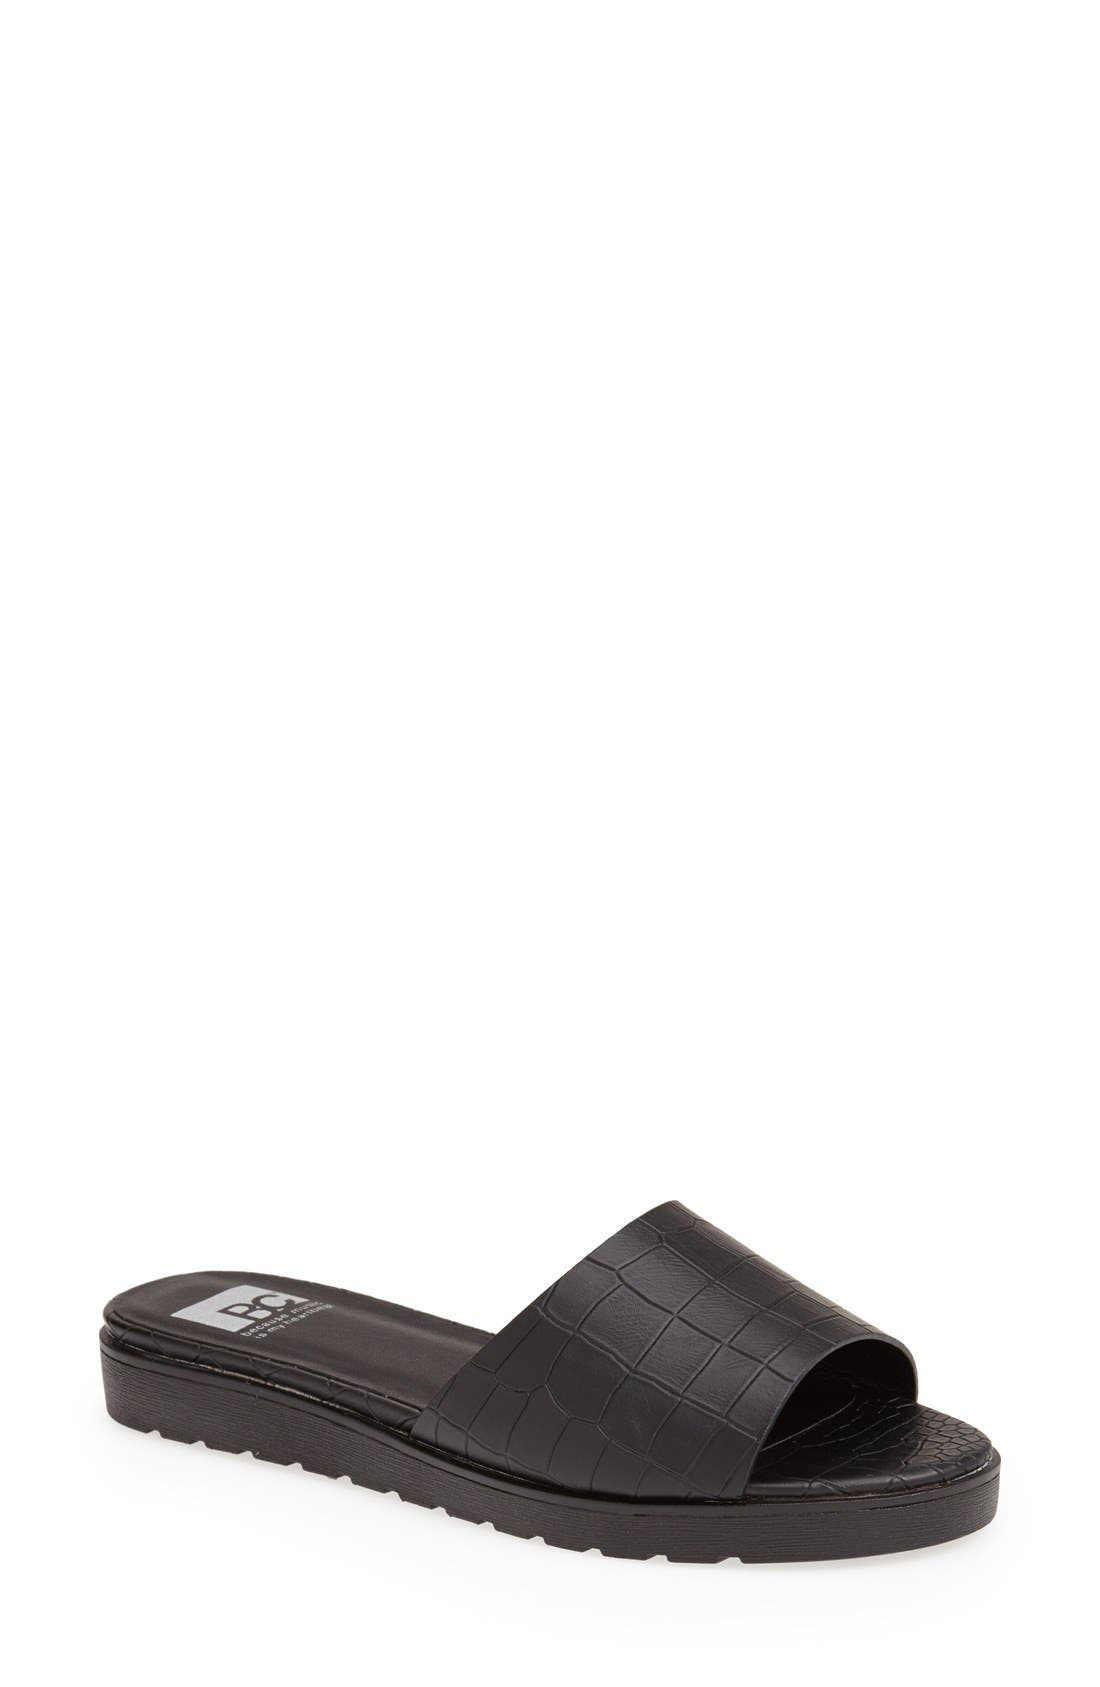 Main Image - BC Footwear 'Inspiration' Slide Sandal (Women)